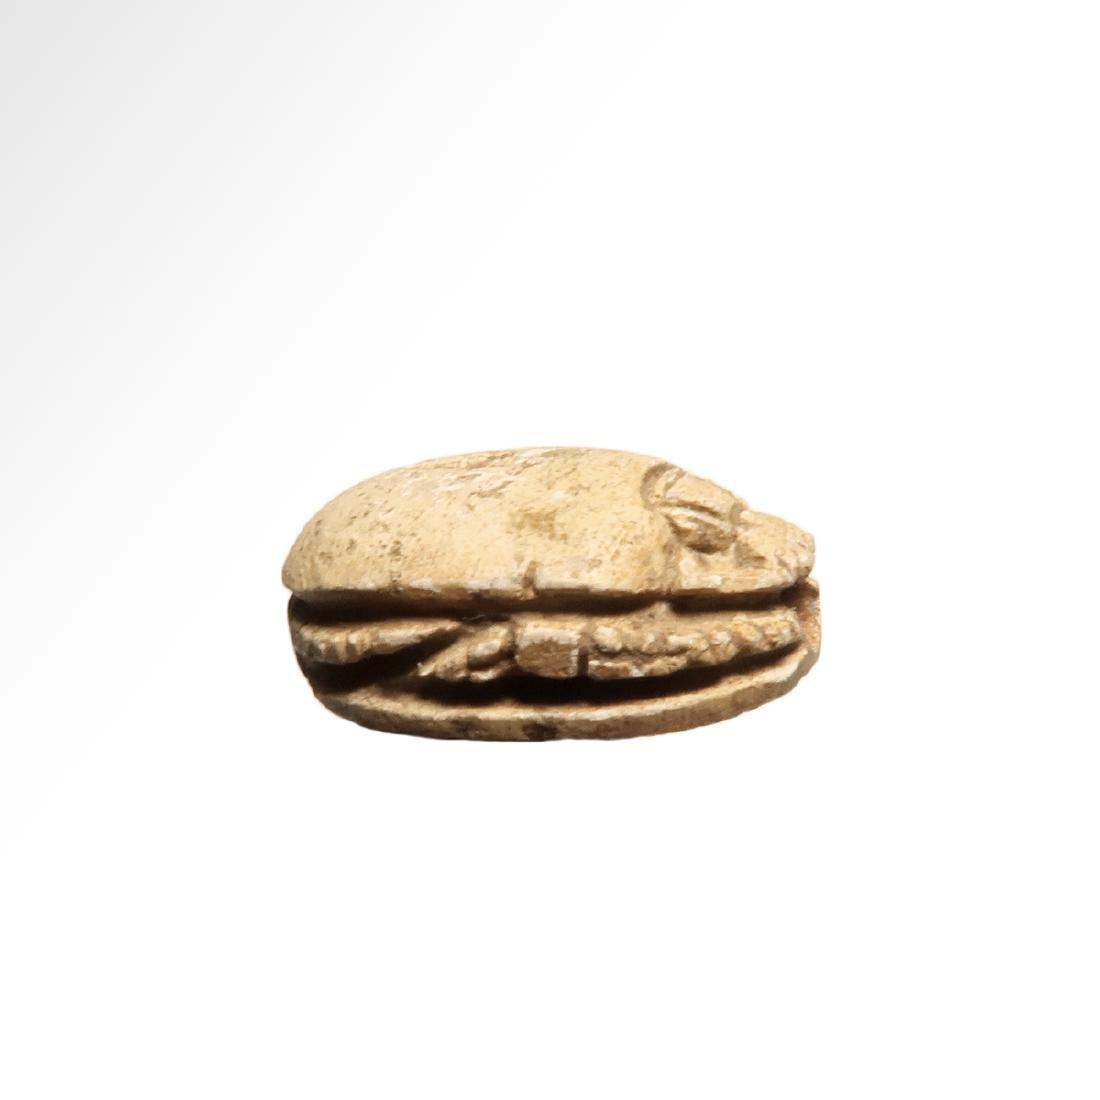 Egyptian Steatite Scarab, Hieroglyphs and Cartouche - 6